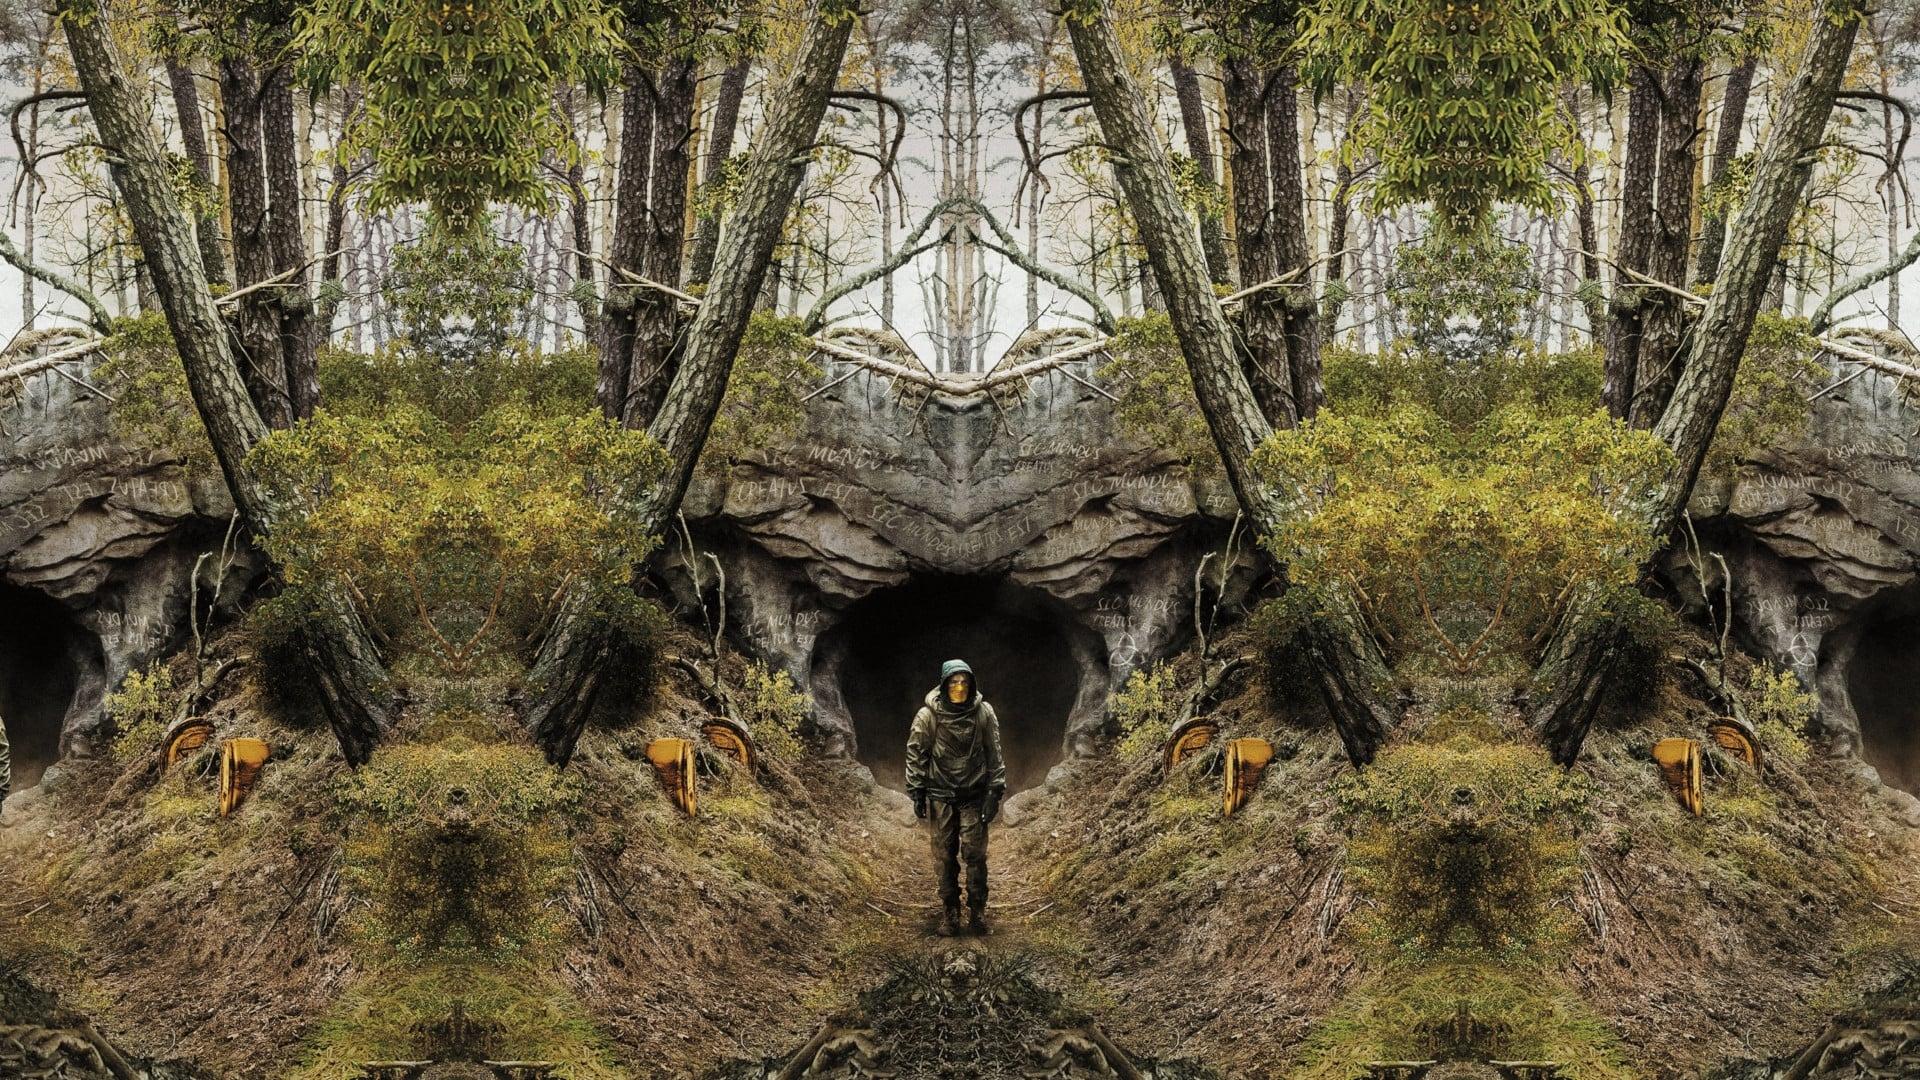 Netflix Dark Season 2 Wallpaper Hd Tv Series 4k Wallpapers Images Photos And Background